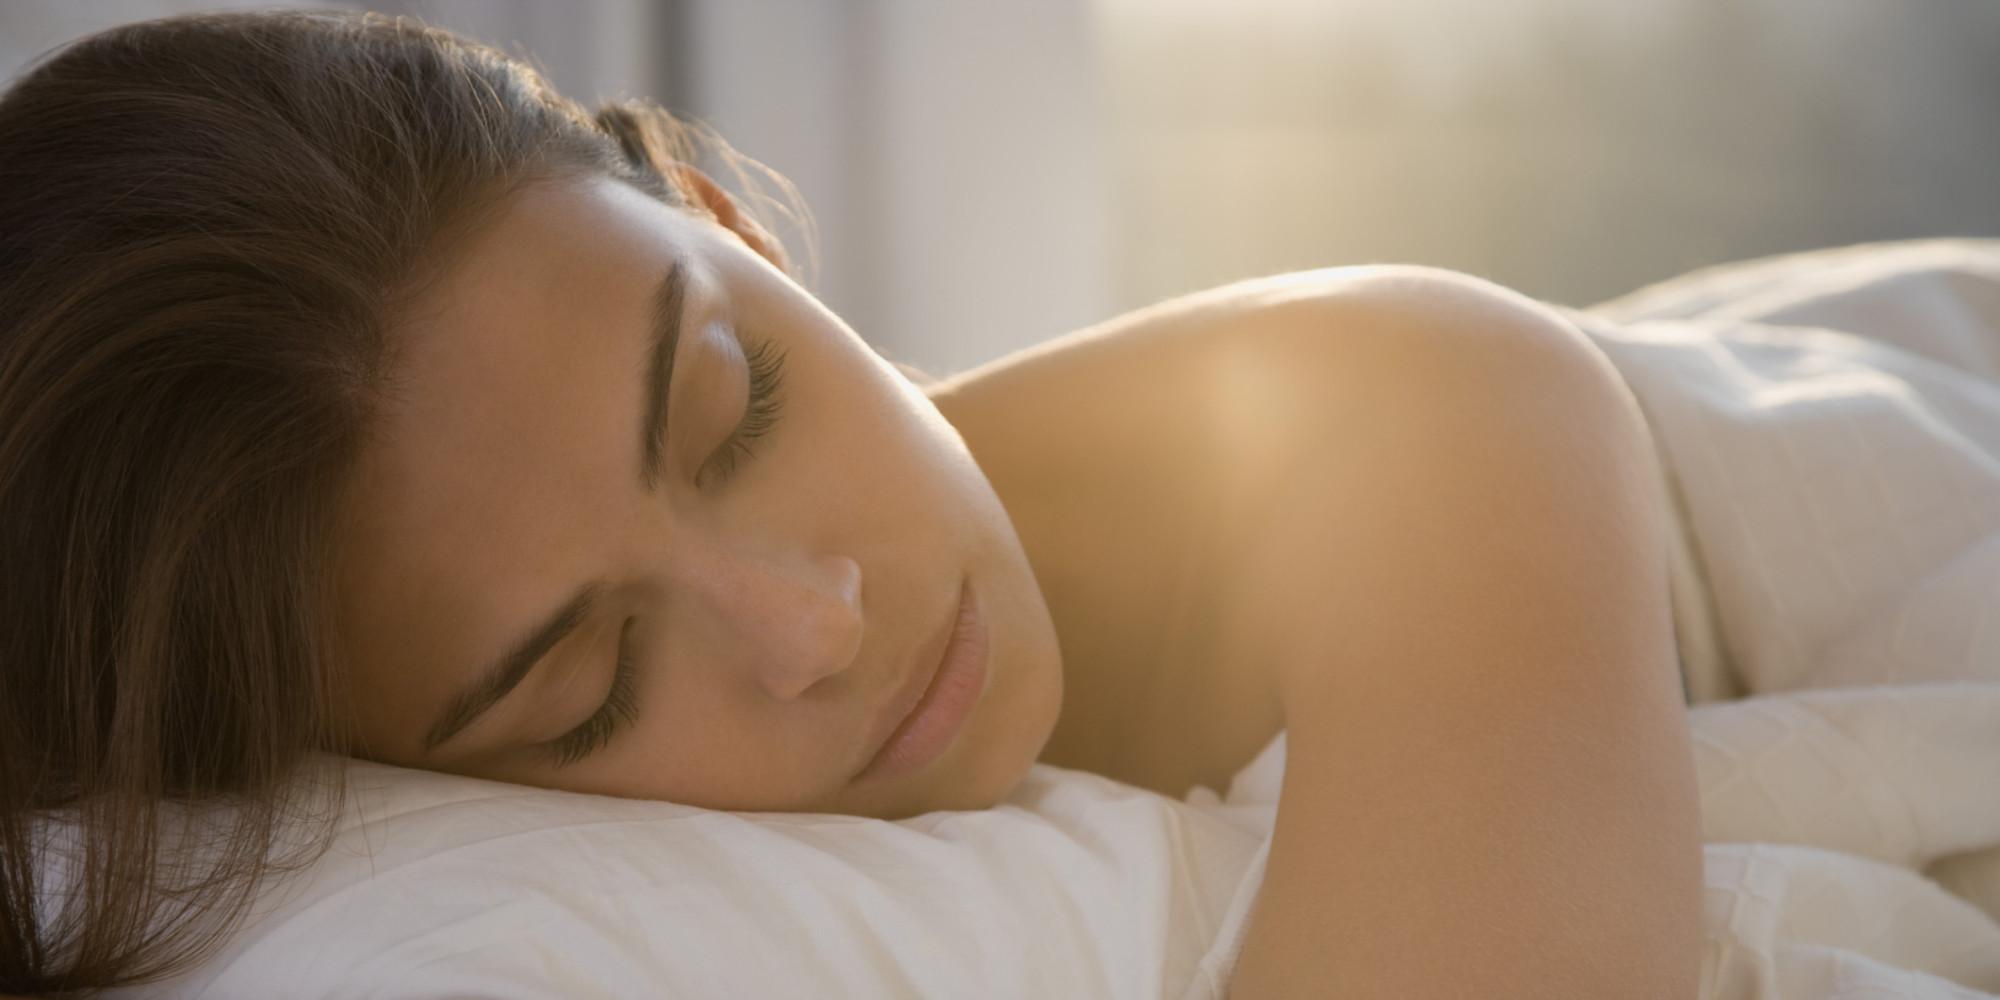 Teen Sleeping Habits Discussed News 44